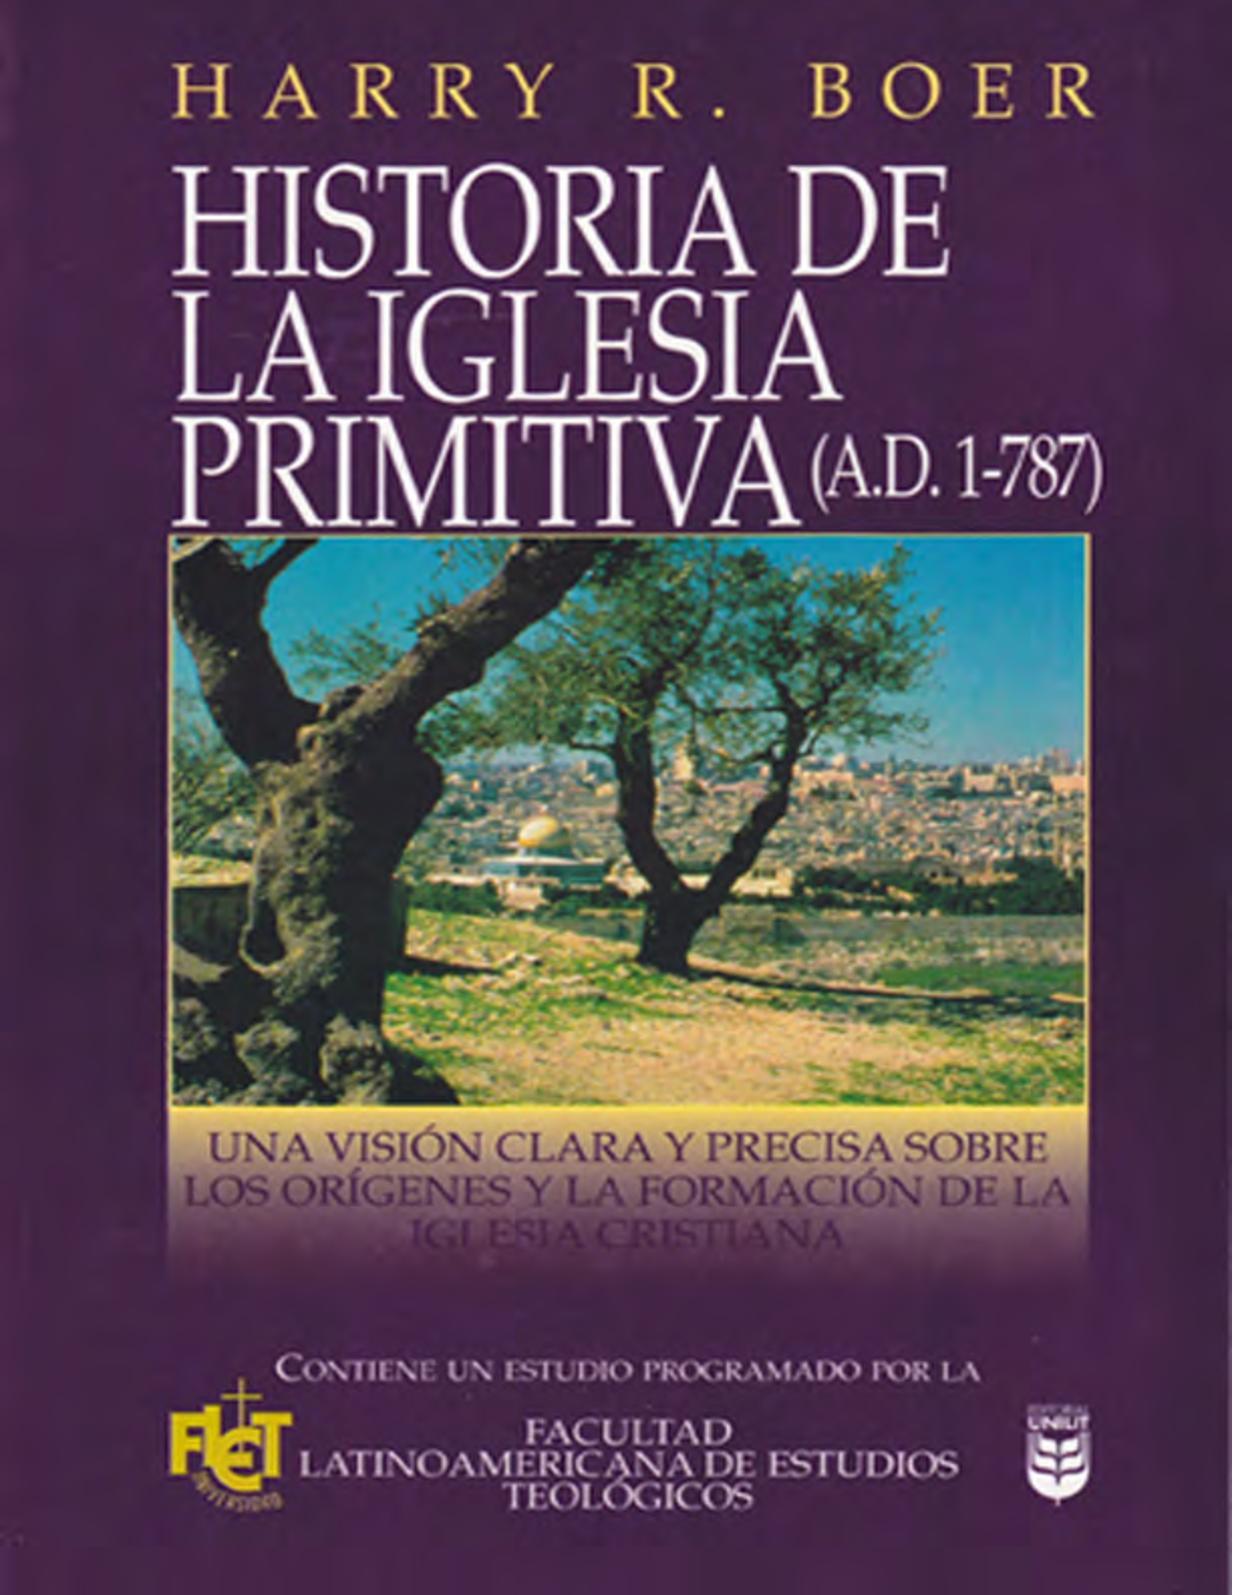 Calaméo Historia De La Iglesia Primitiva Harry Boer